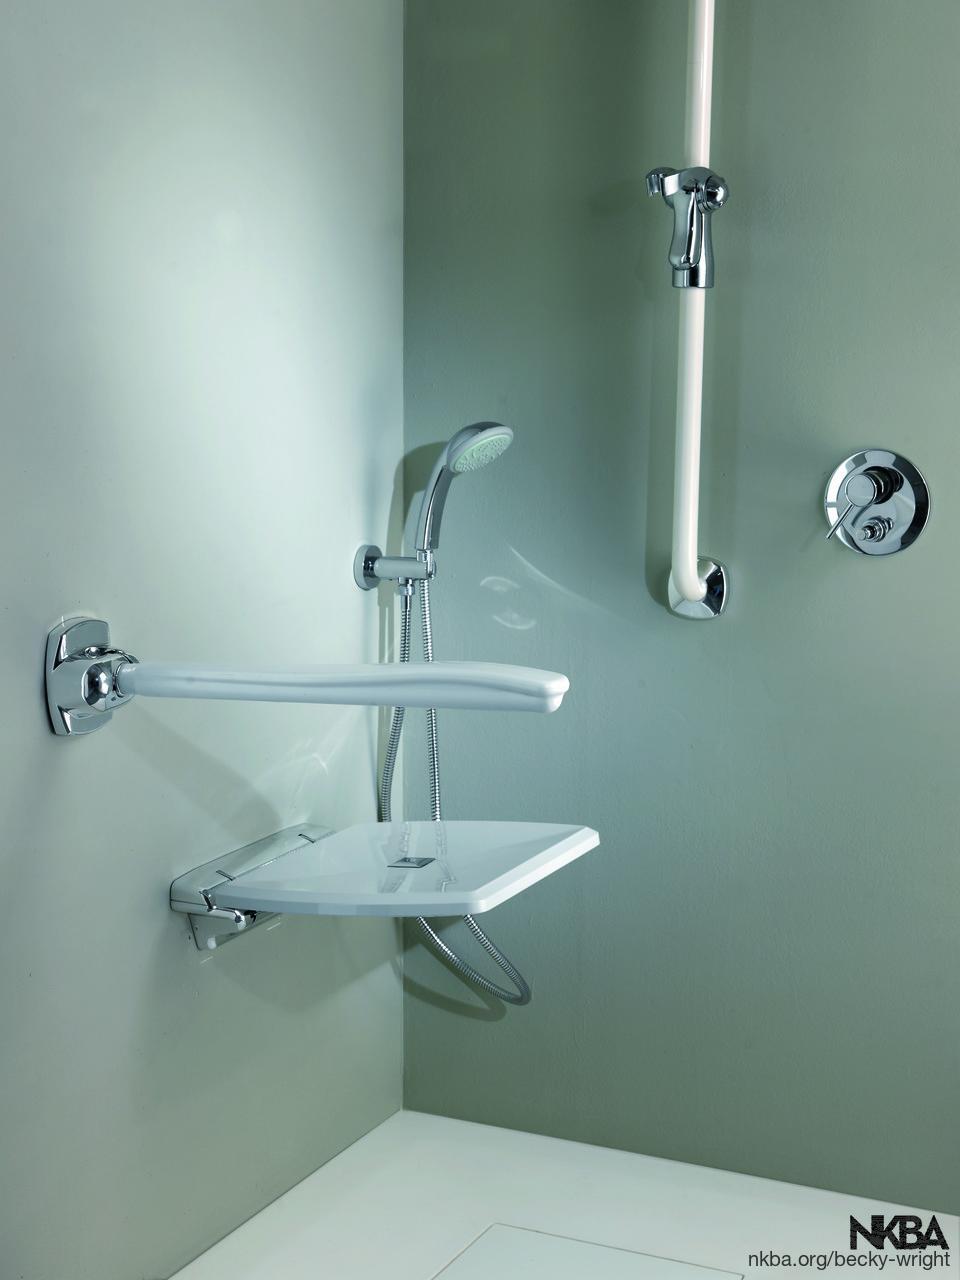 Folding Shower Seat and Folding Grab Bar - NKBA